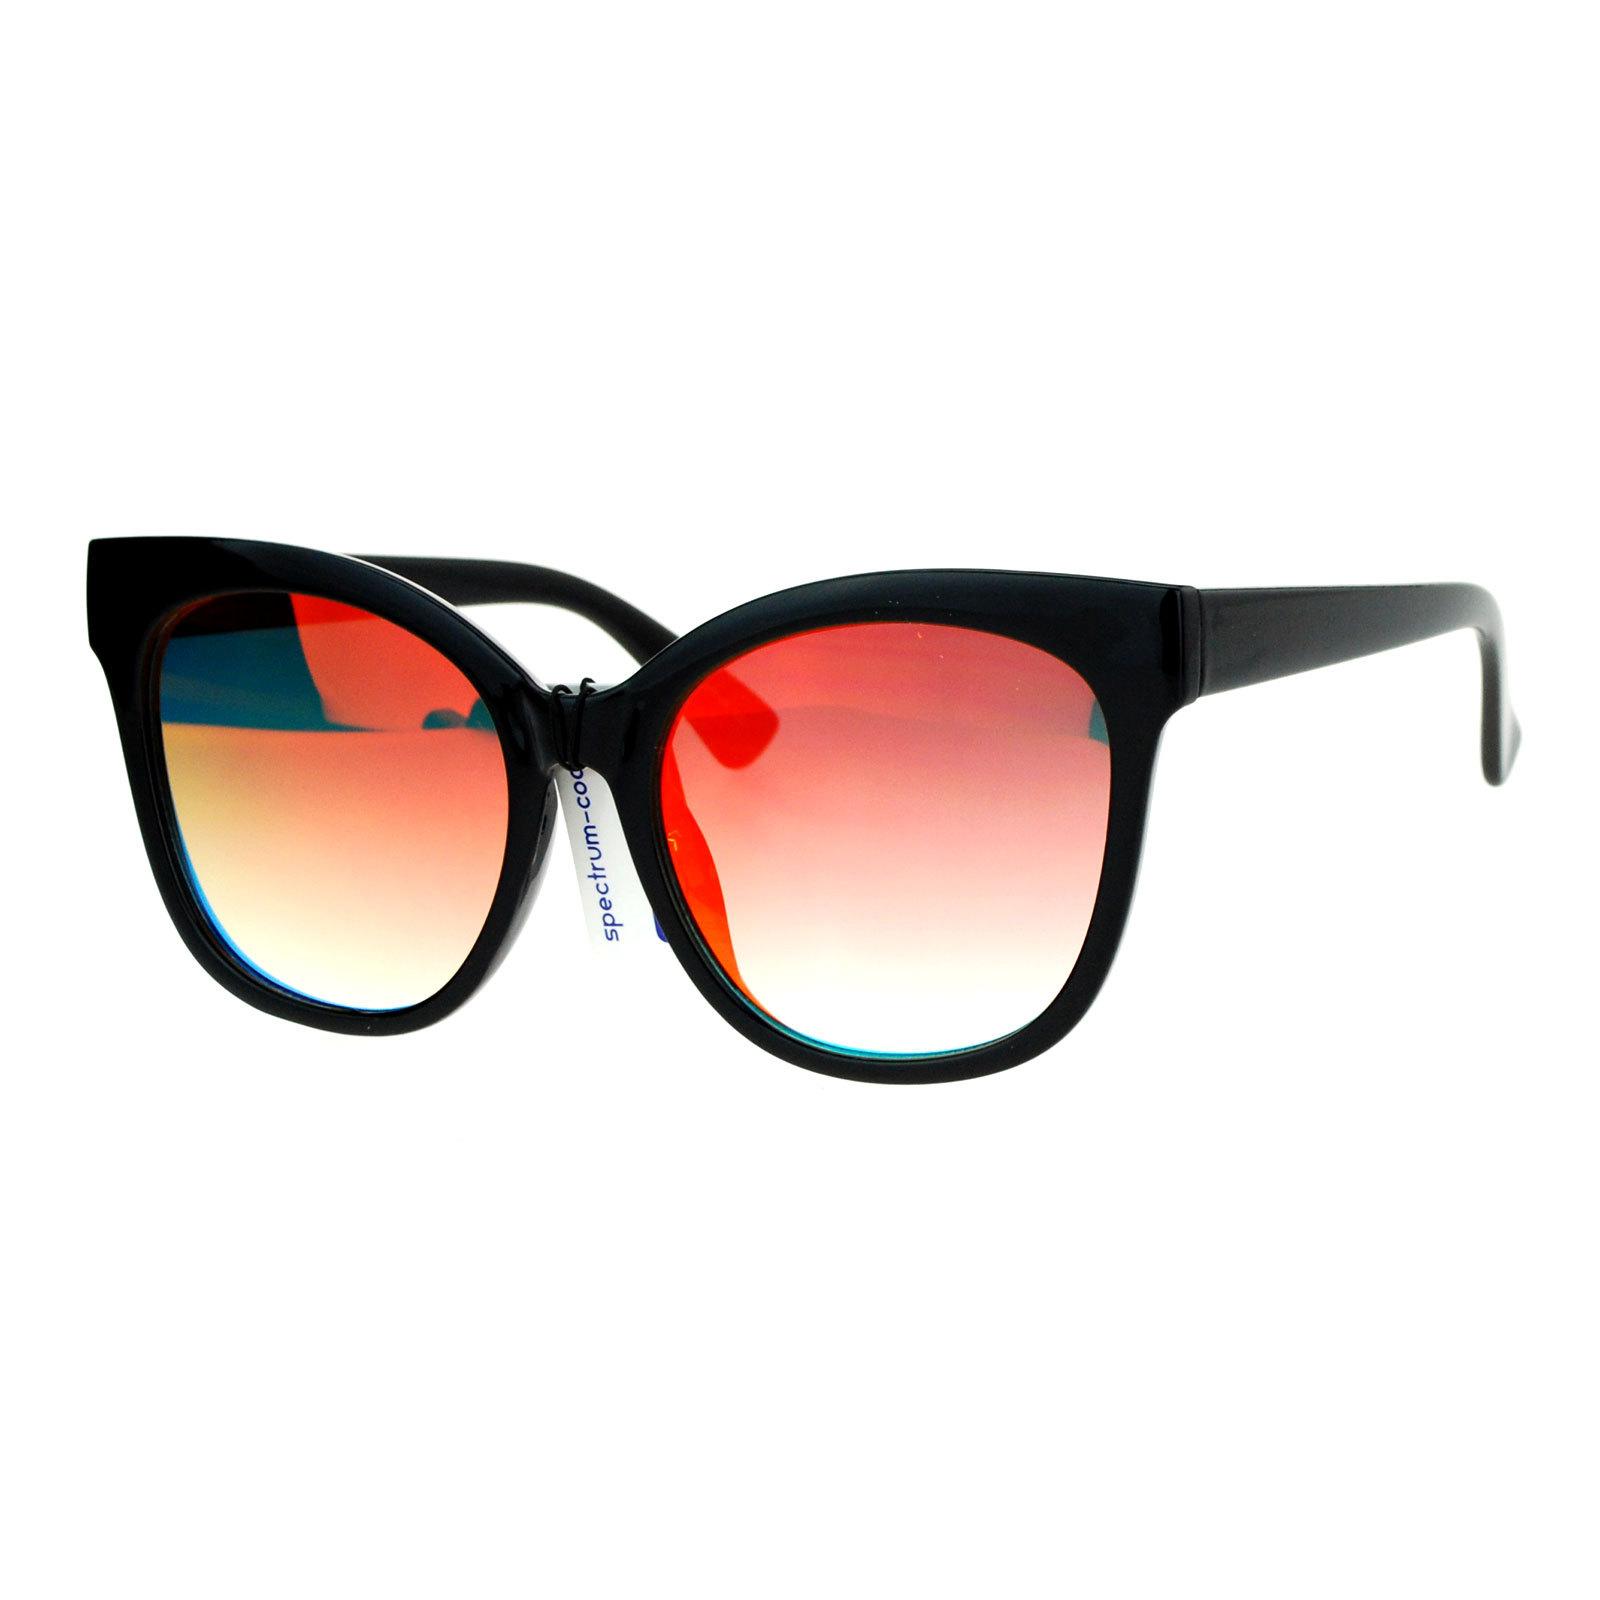 SA106 Color Mirror Flat Lens Oversize Horn Rim Sunglasses